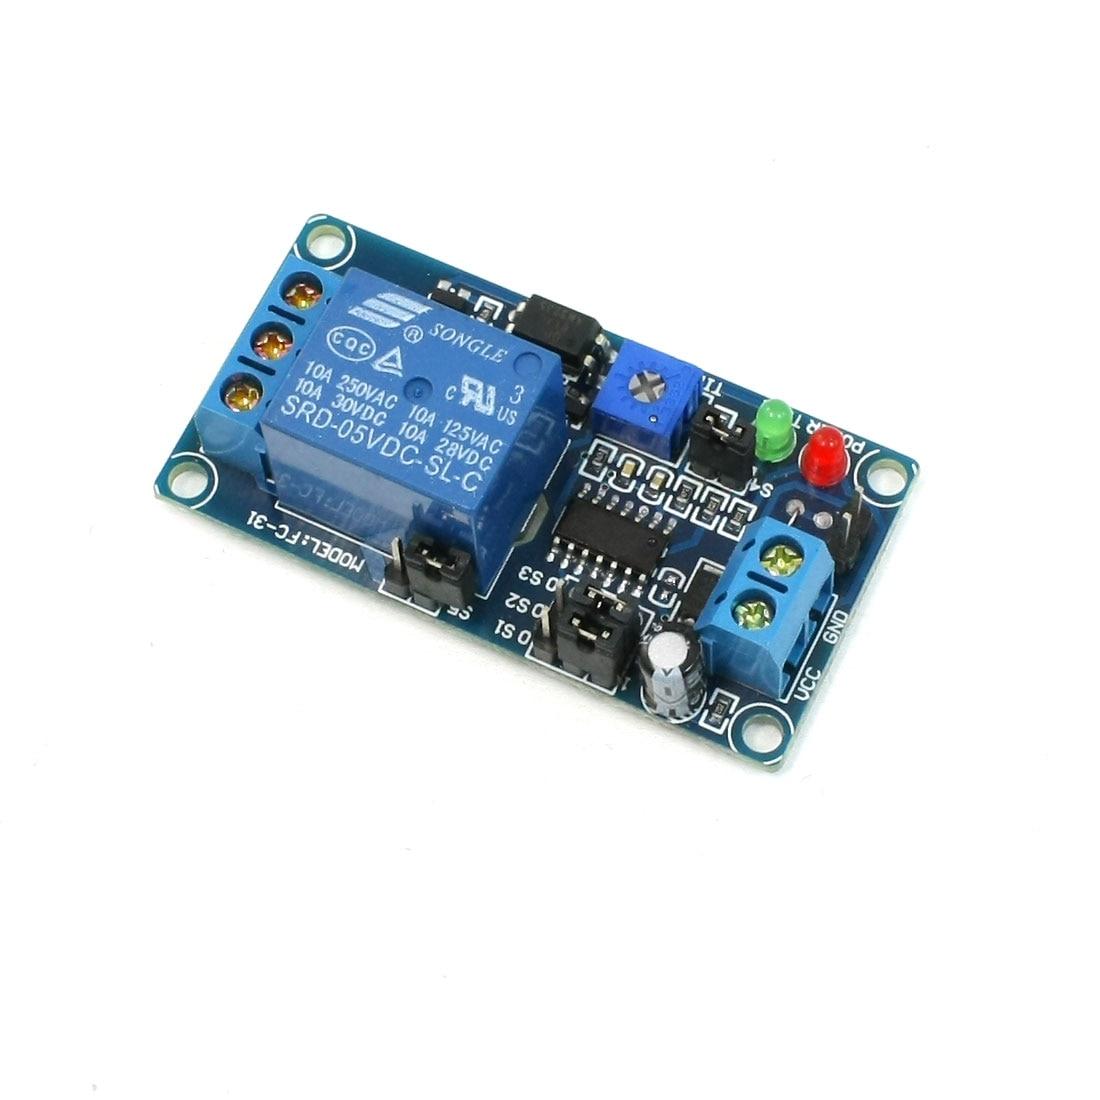 5V Circulate Time Relay Module Control Board Srd-5Vdc-Sl-C